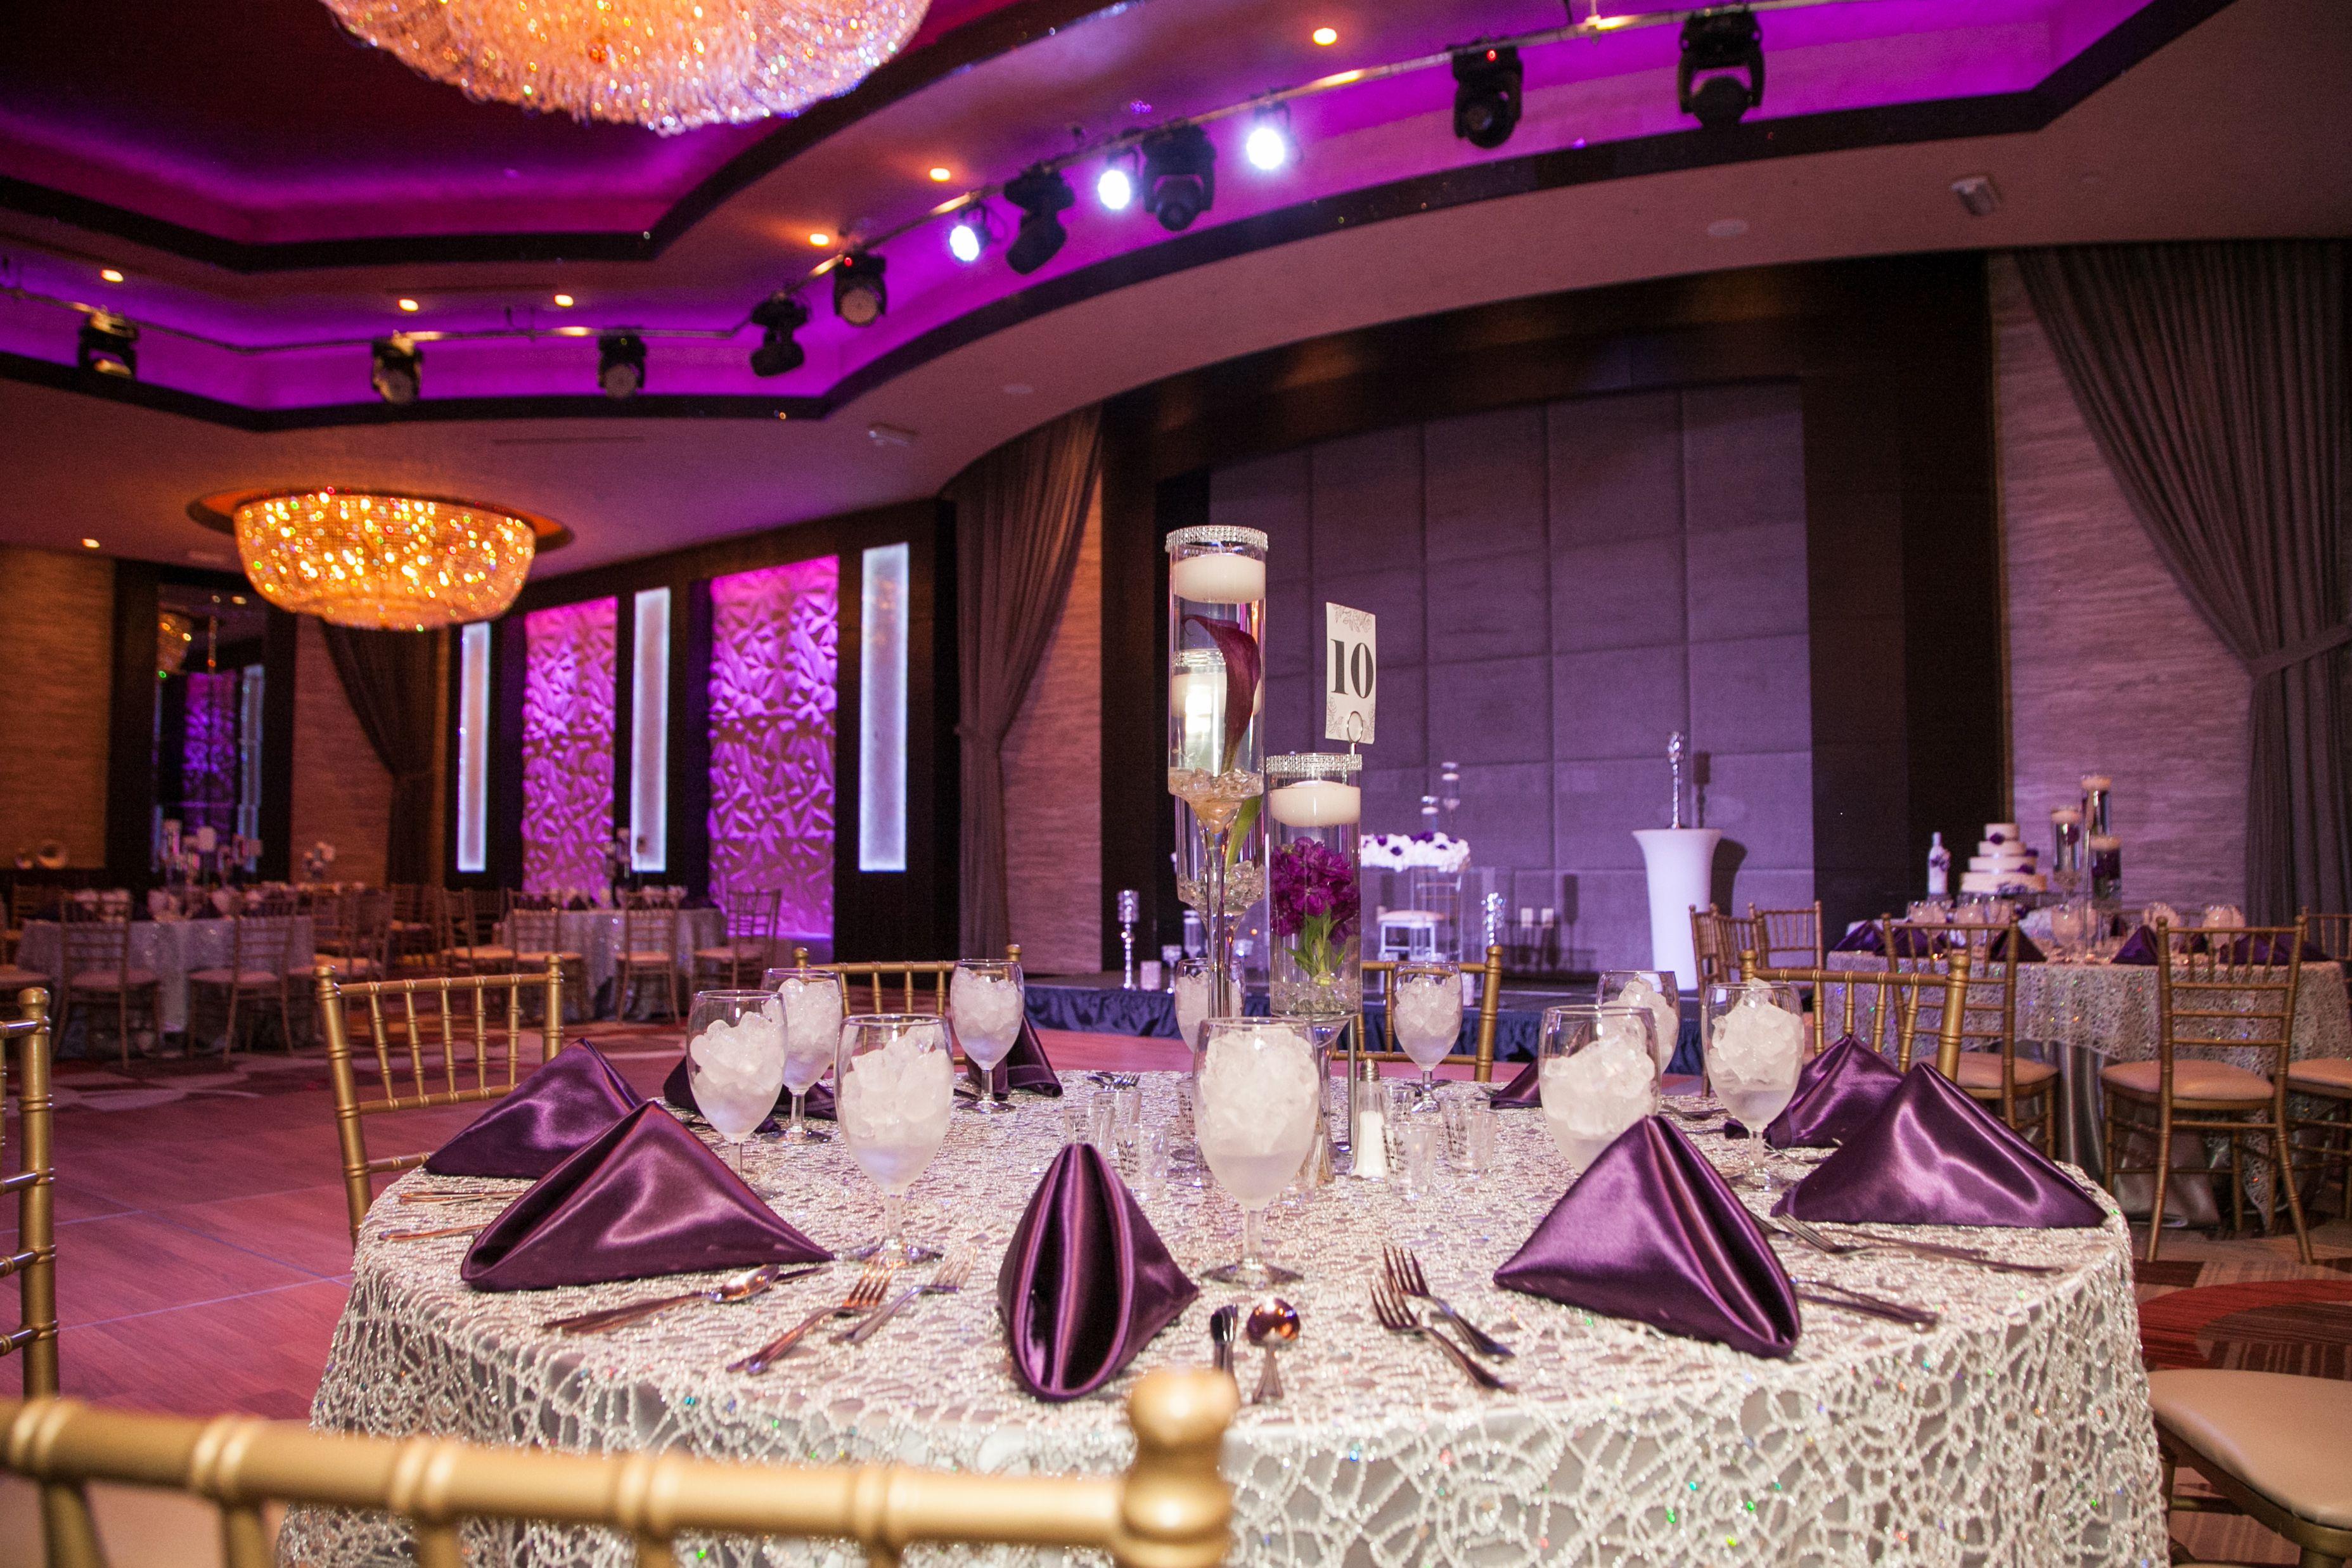 Fabrizio Banquet Hall Located In The Arts District Of Las Vegas Destination Wedding Elopement Las Vegas Destination Wedding Las Vegas Weddings Vegas Wedding